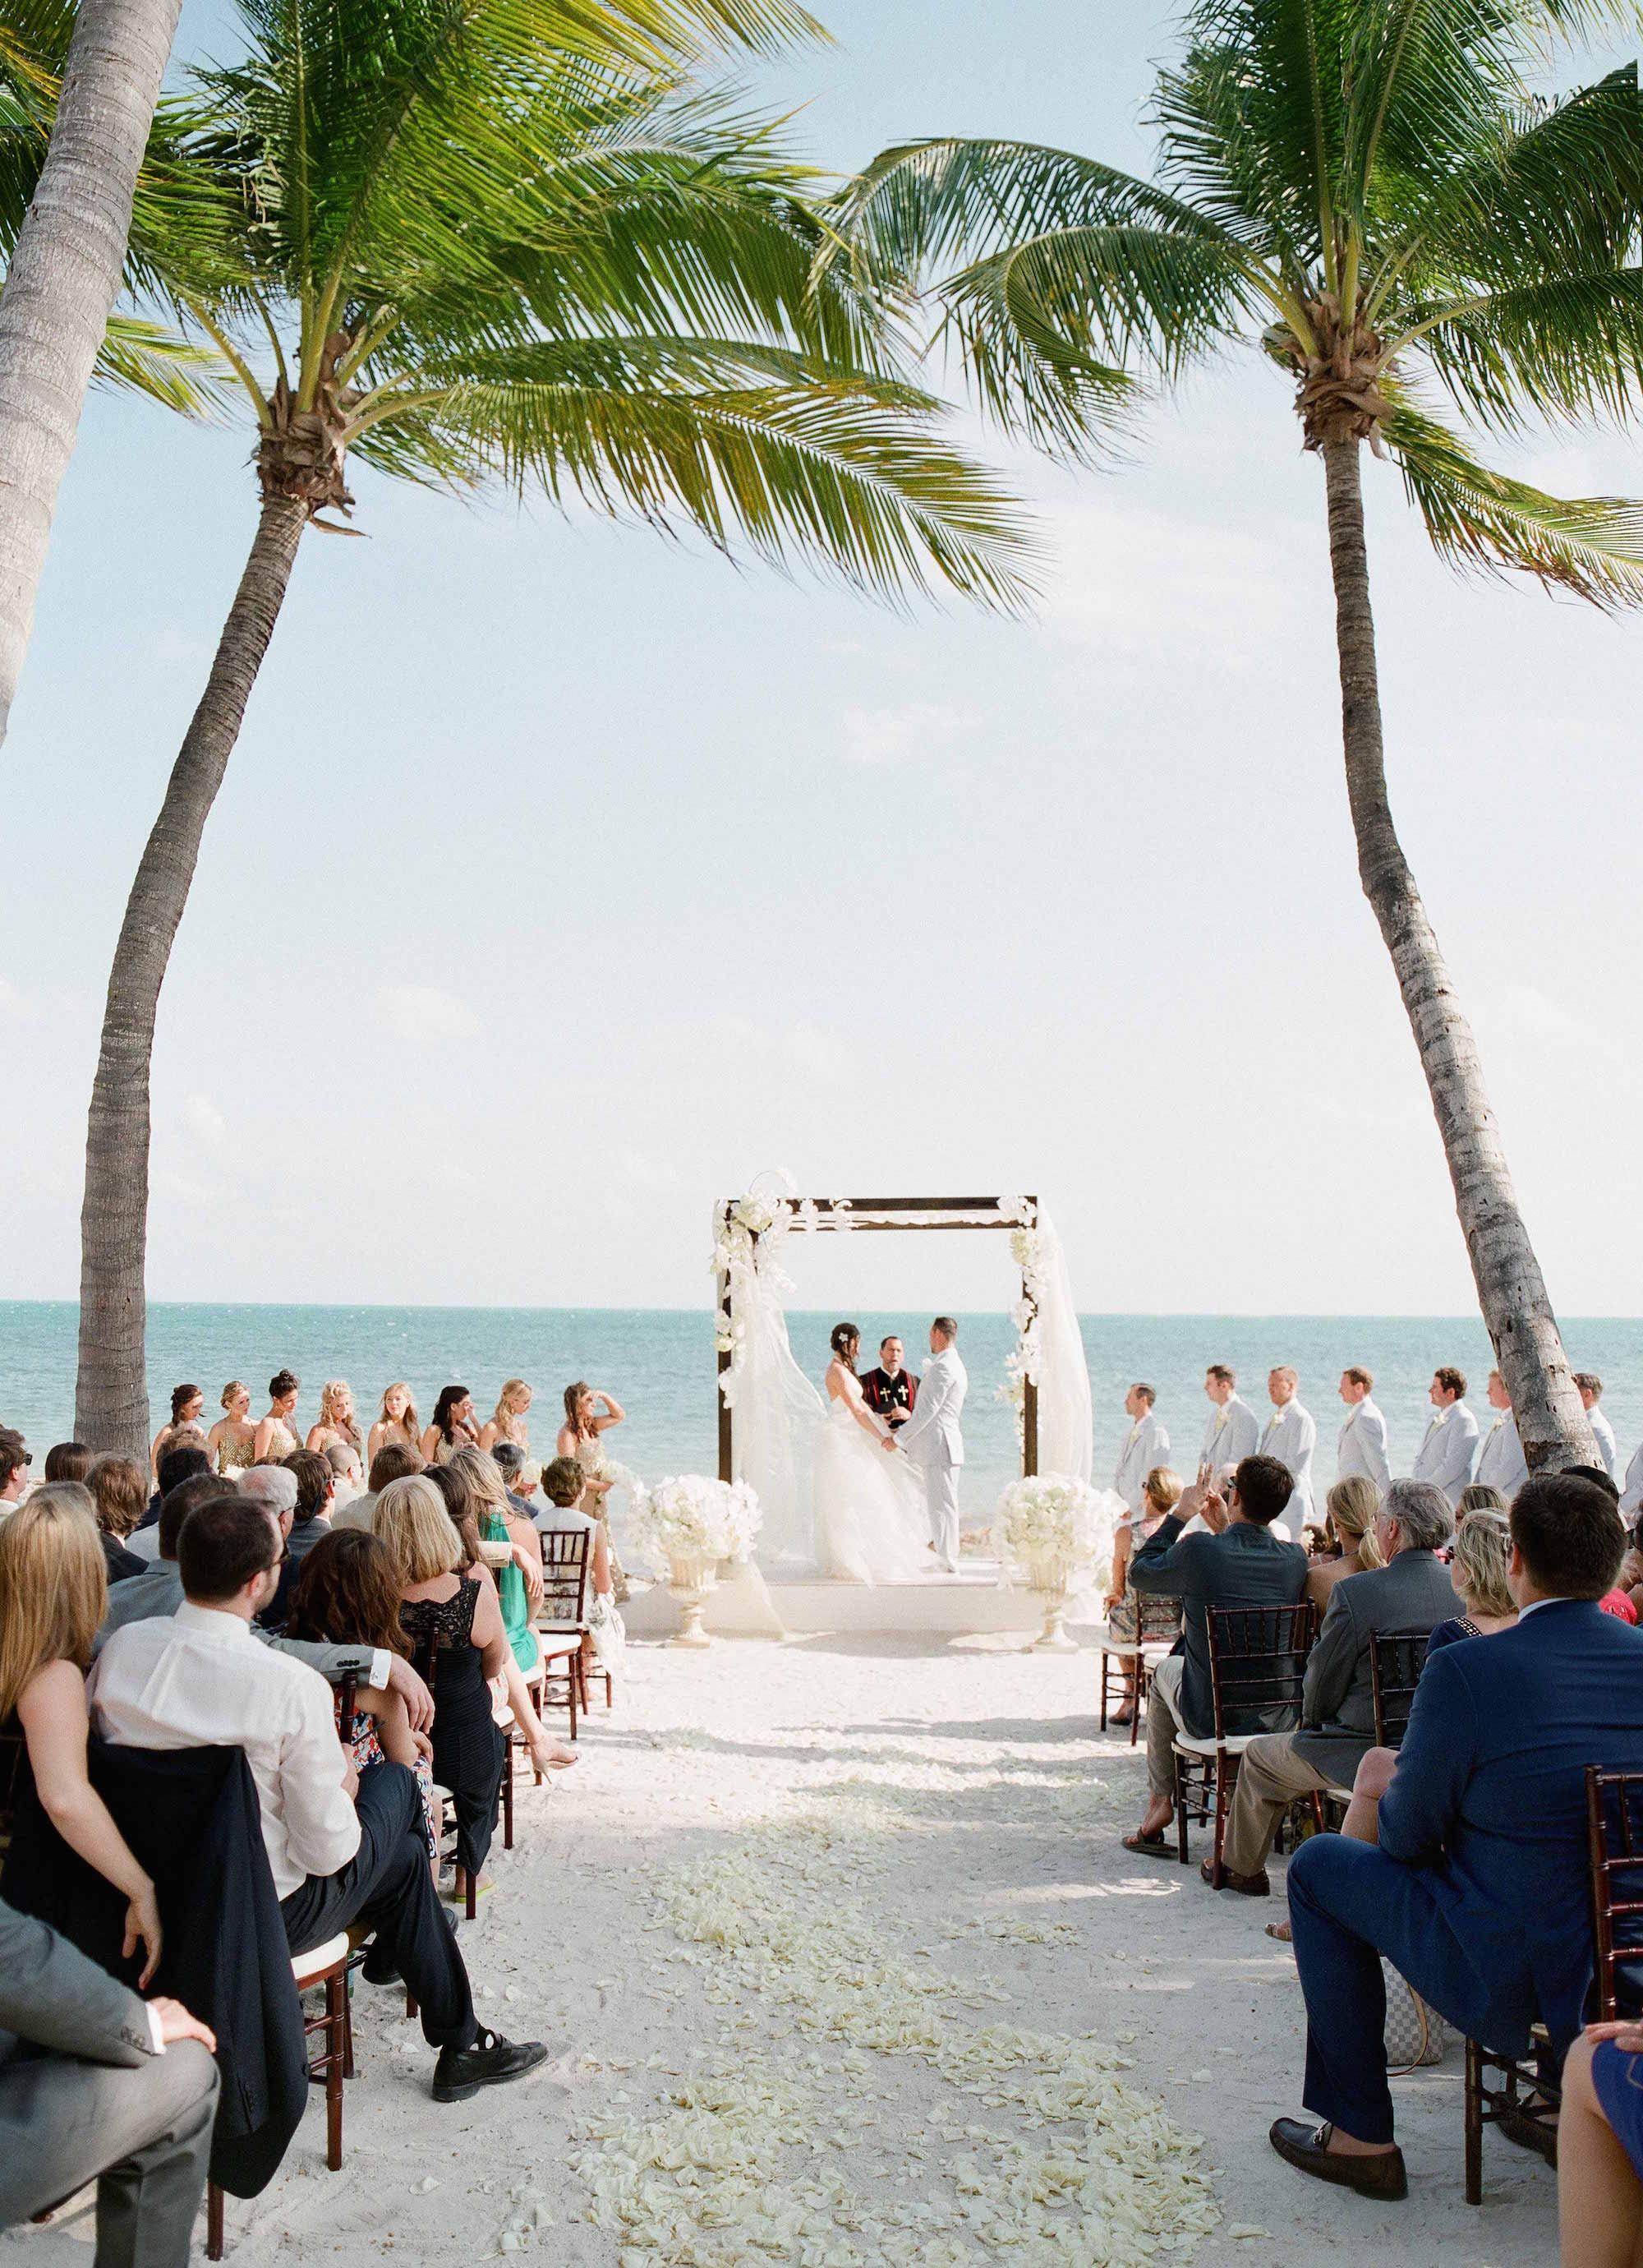 Wedding Ideas: Tropical Décor Concepts for Your Wedding - Inside ...